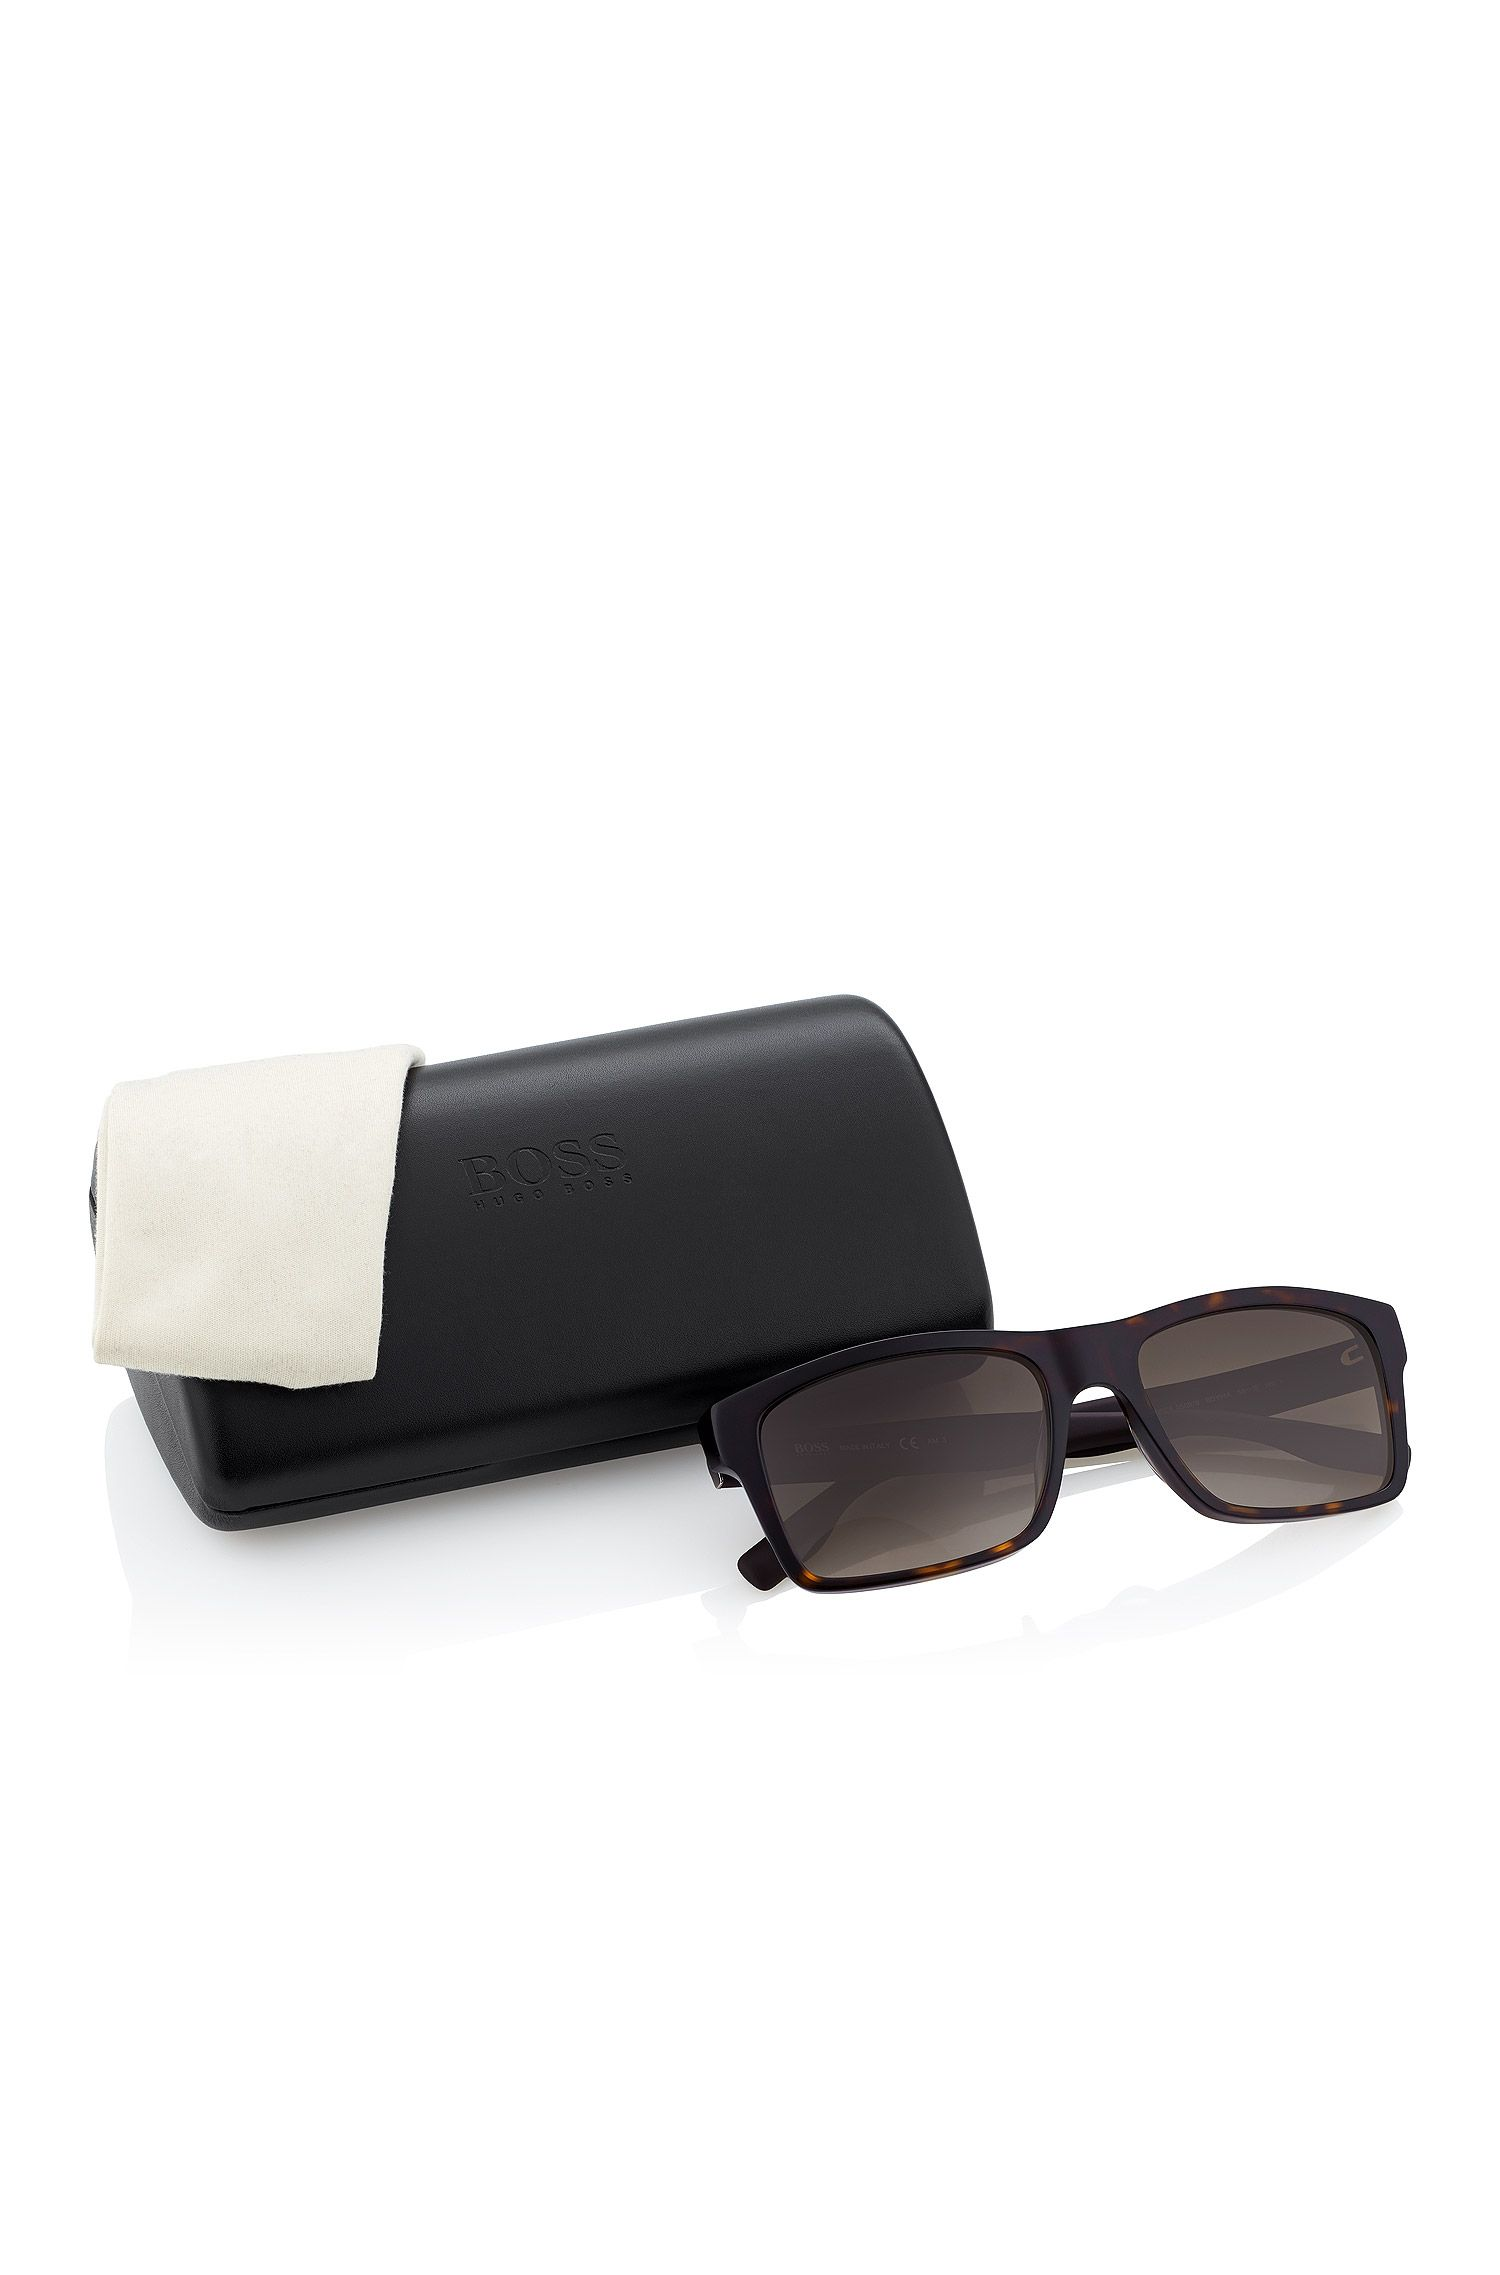 Sonnenbrille ´BOSS 0509/SBDY55HA`